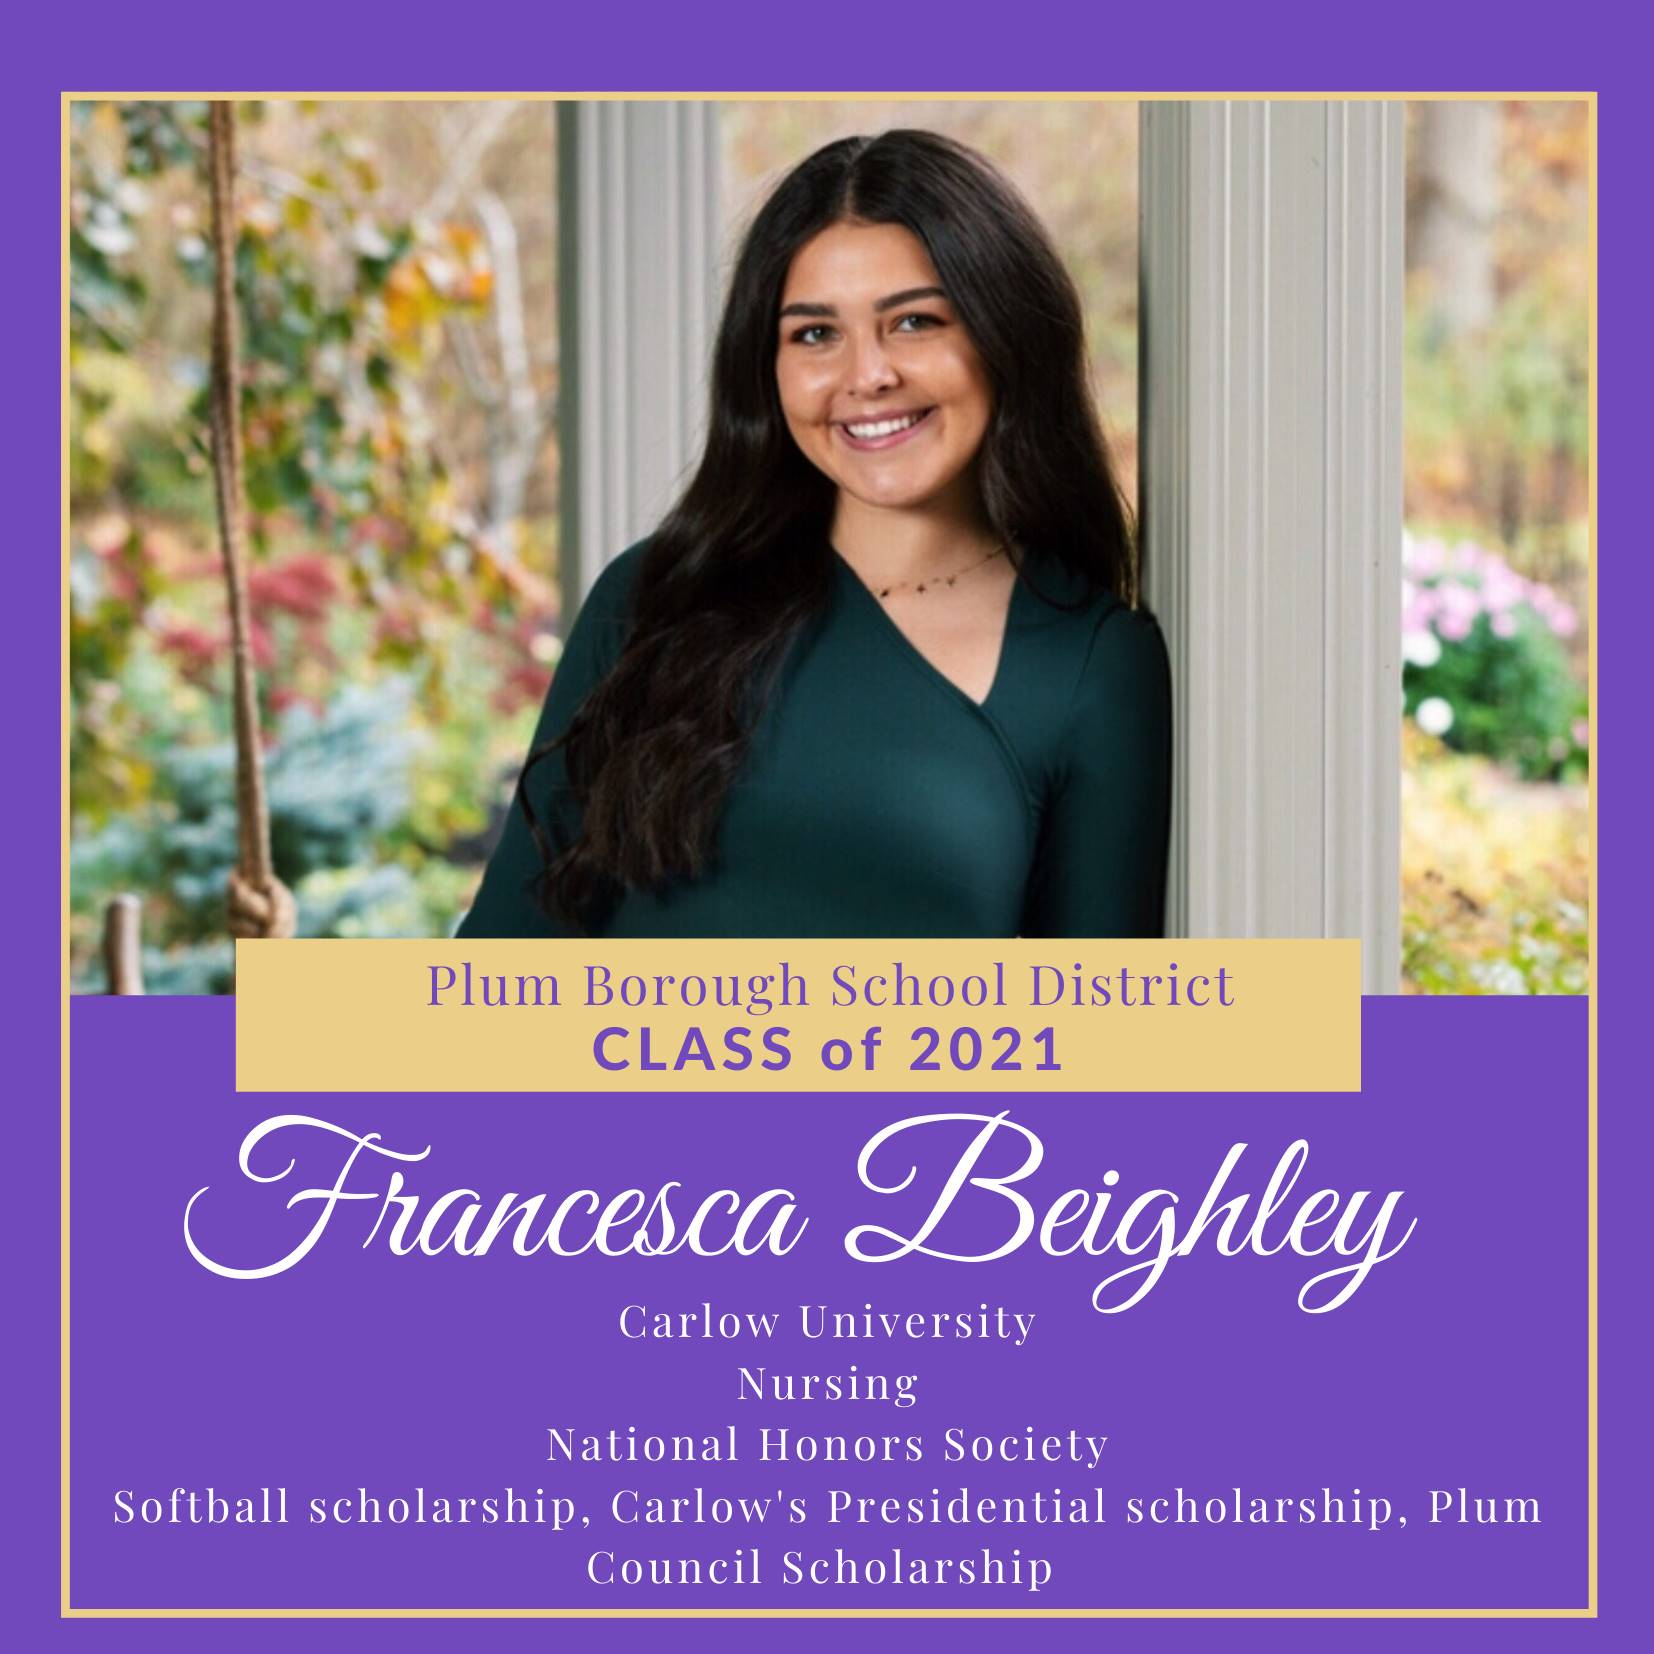 Congratulations to Francesca Beighley, Class of 2021!